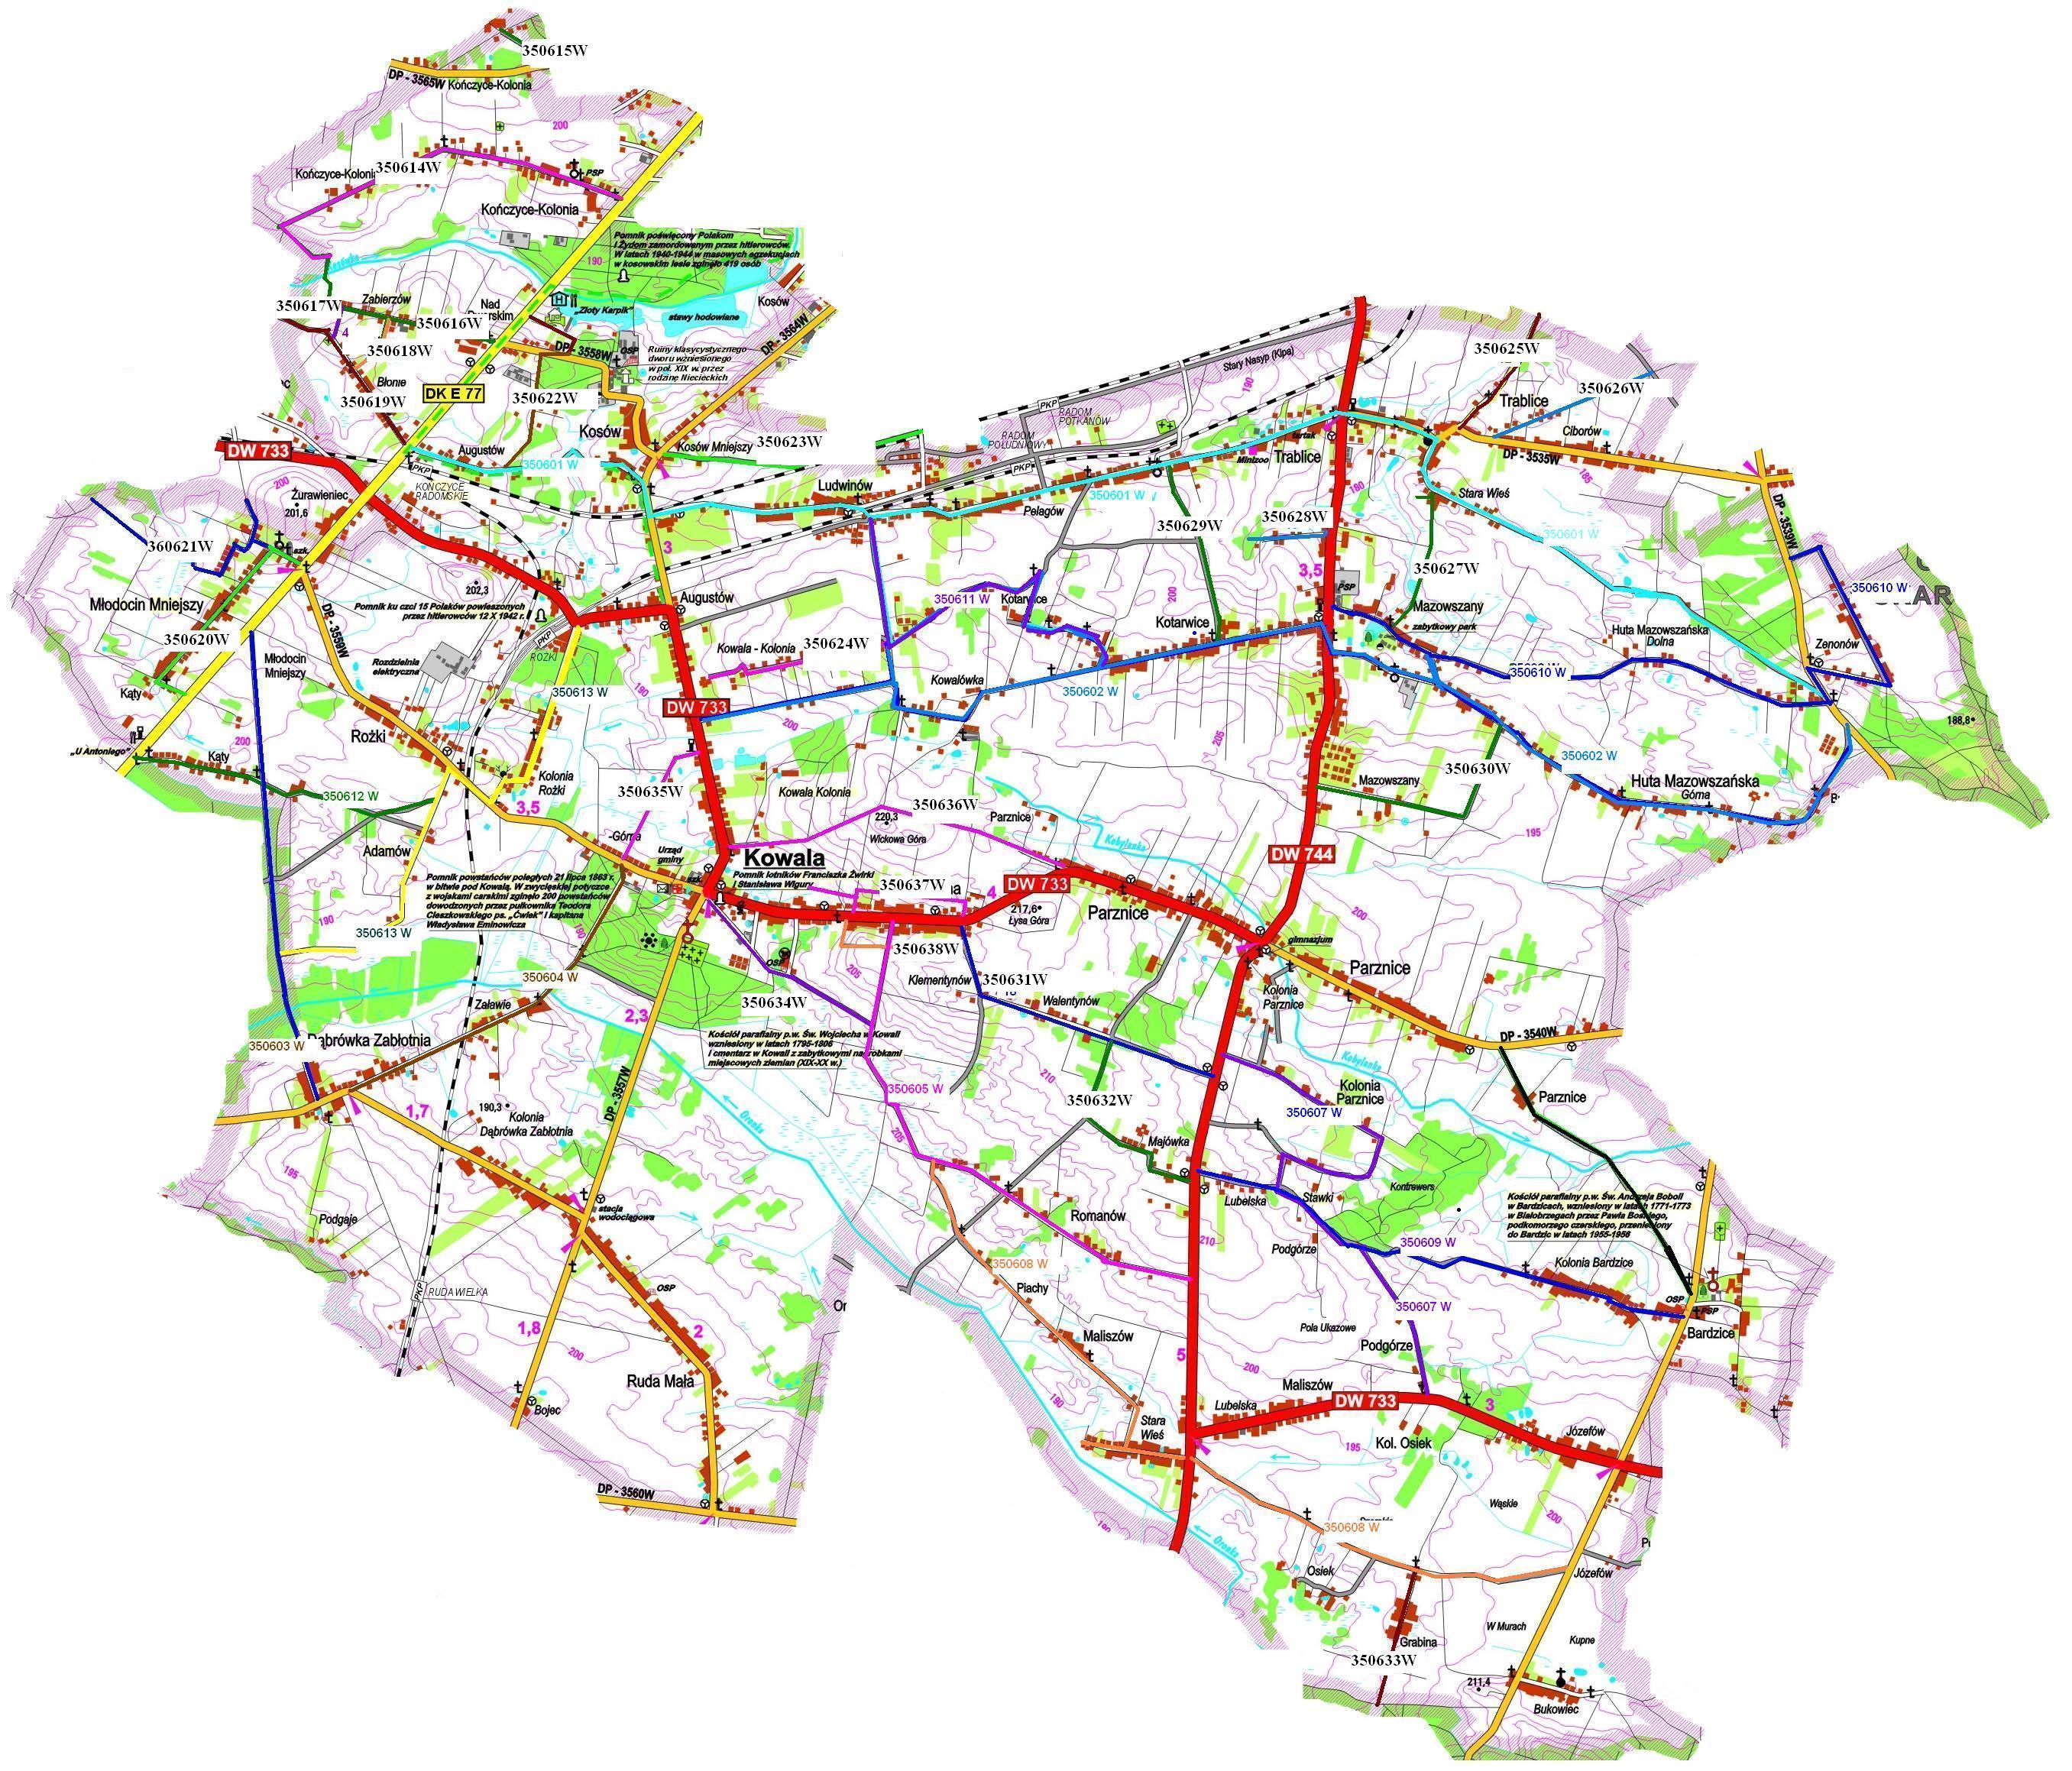 - majlepsza_mapa.jpg